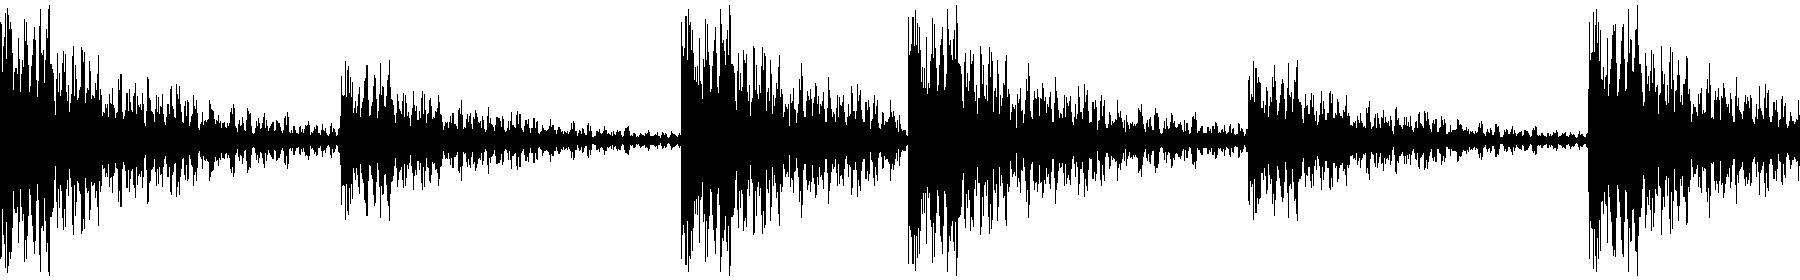 bluezone bc0210 percussion loop 020 110